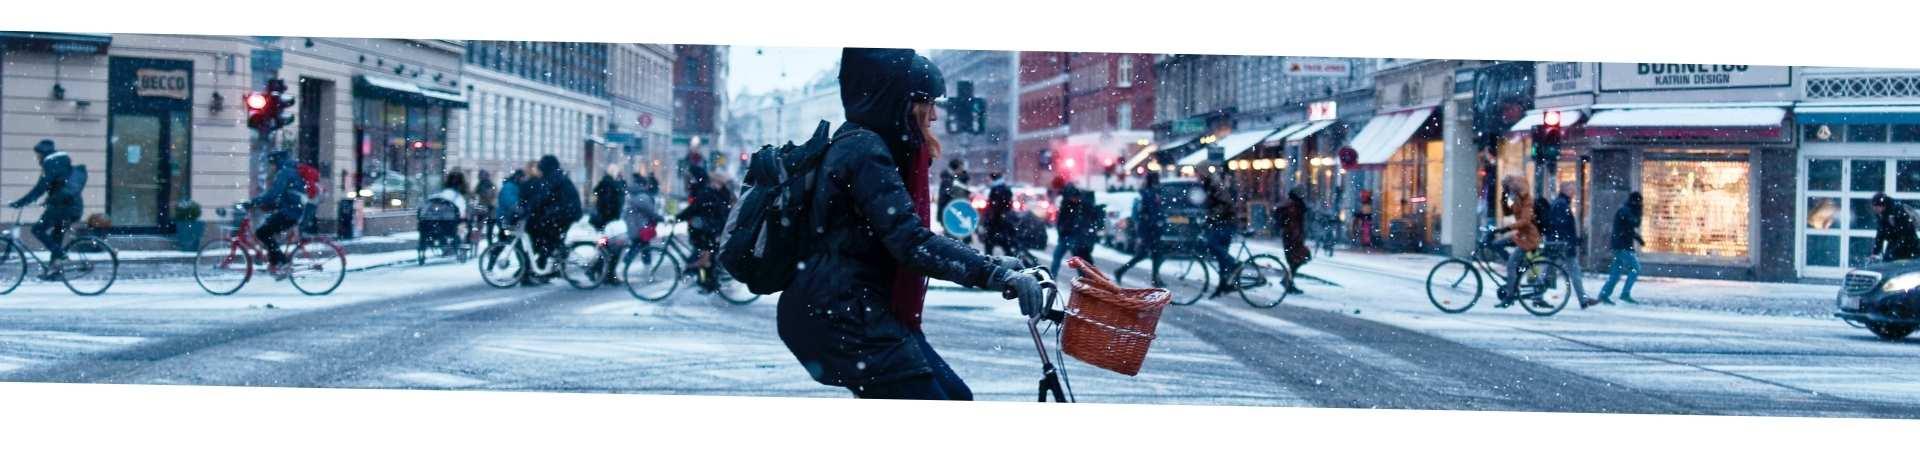 vélo dans la neige en hiver